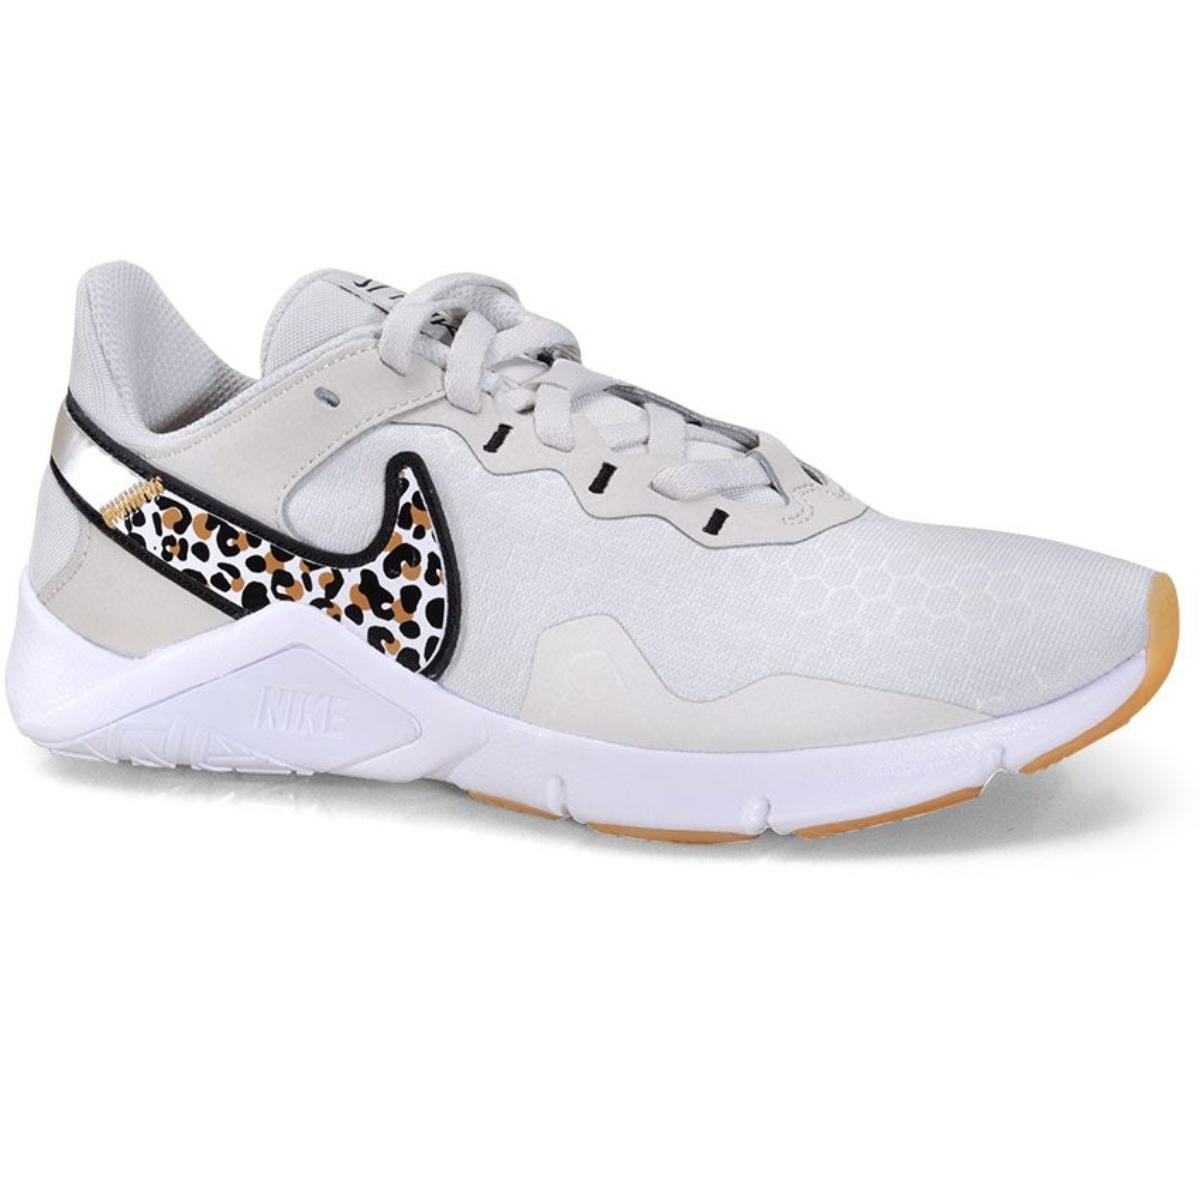 Tênis Feminino Nike Cz3668-017 Legend Essential 2 Bege